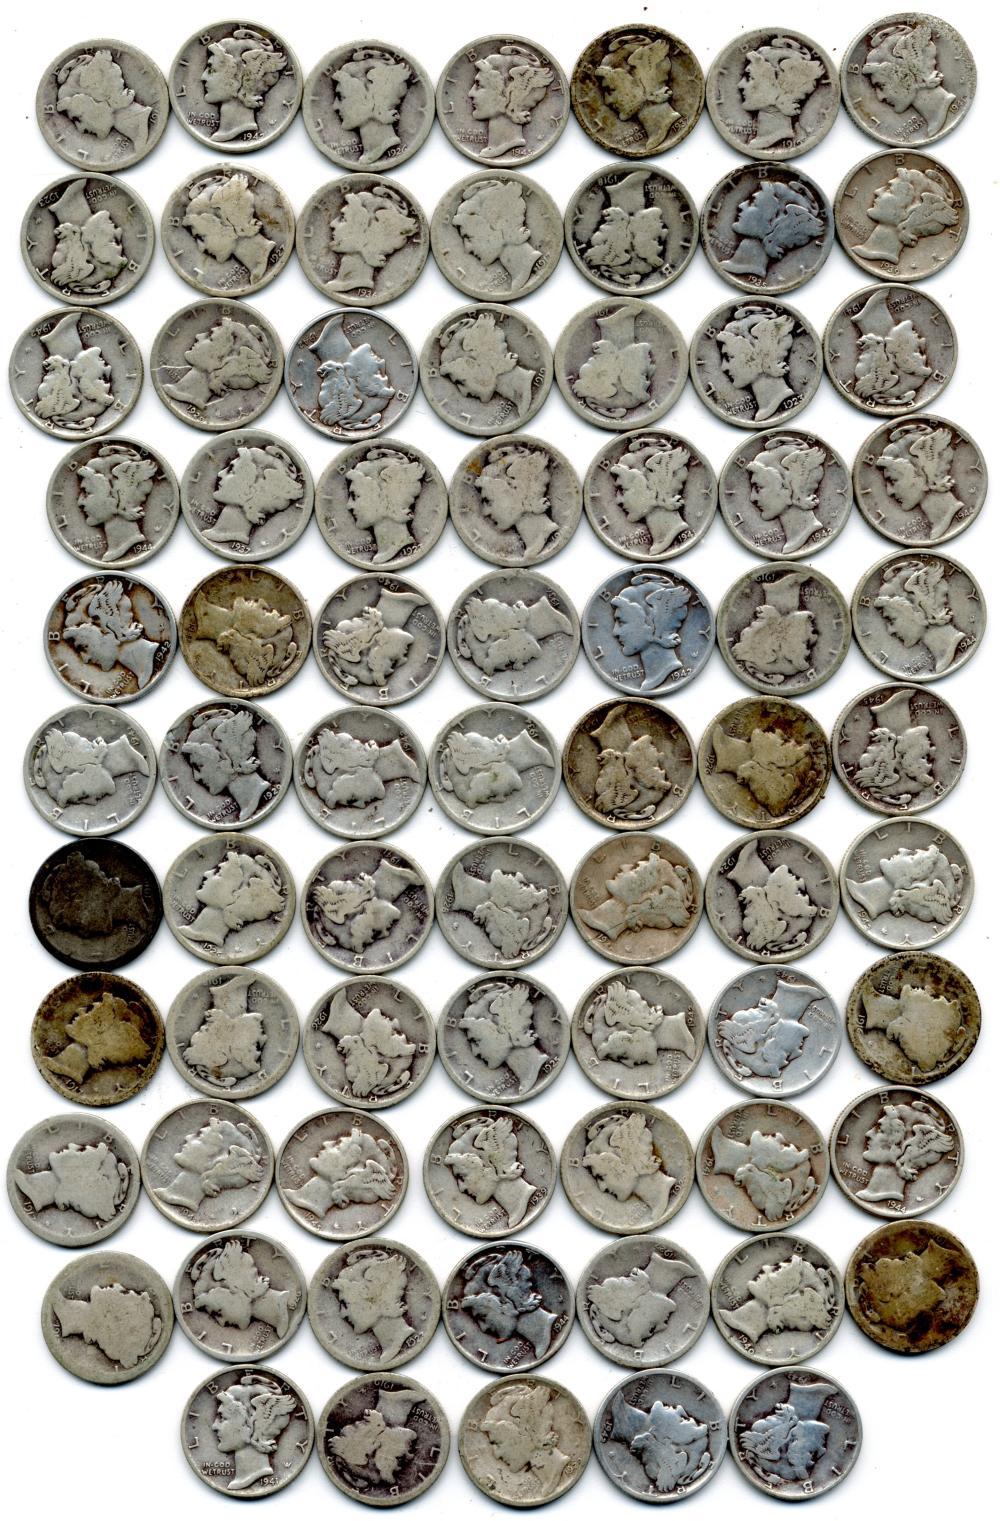 $7.50 Face Value U.S. Silver Mercury Dimes